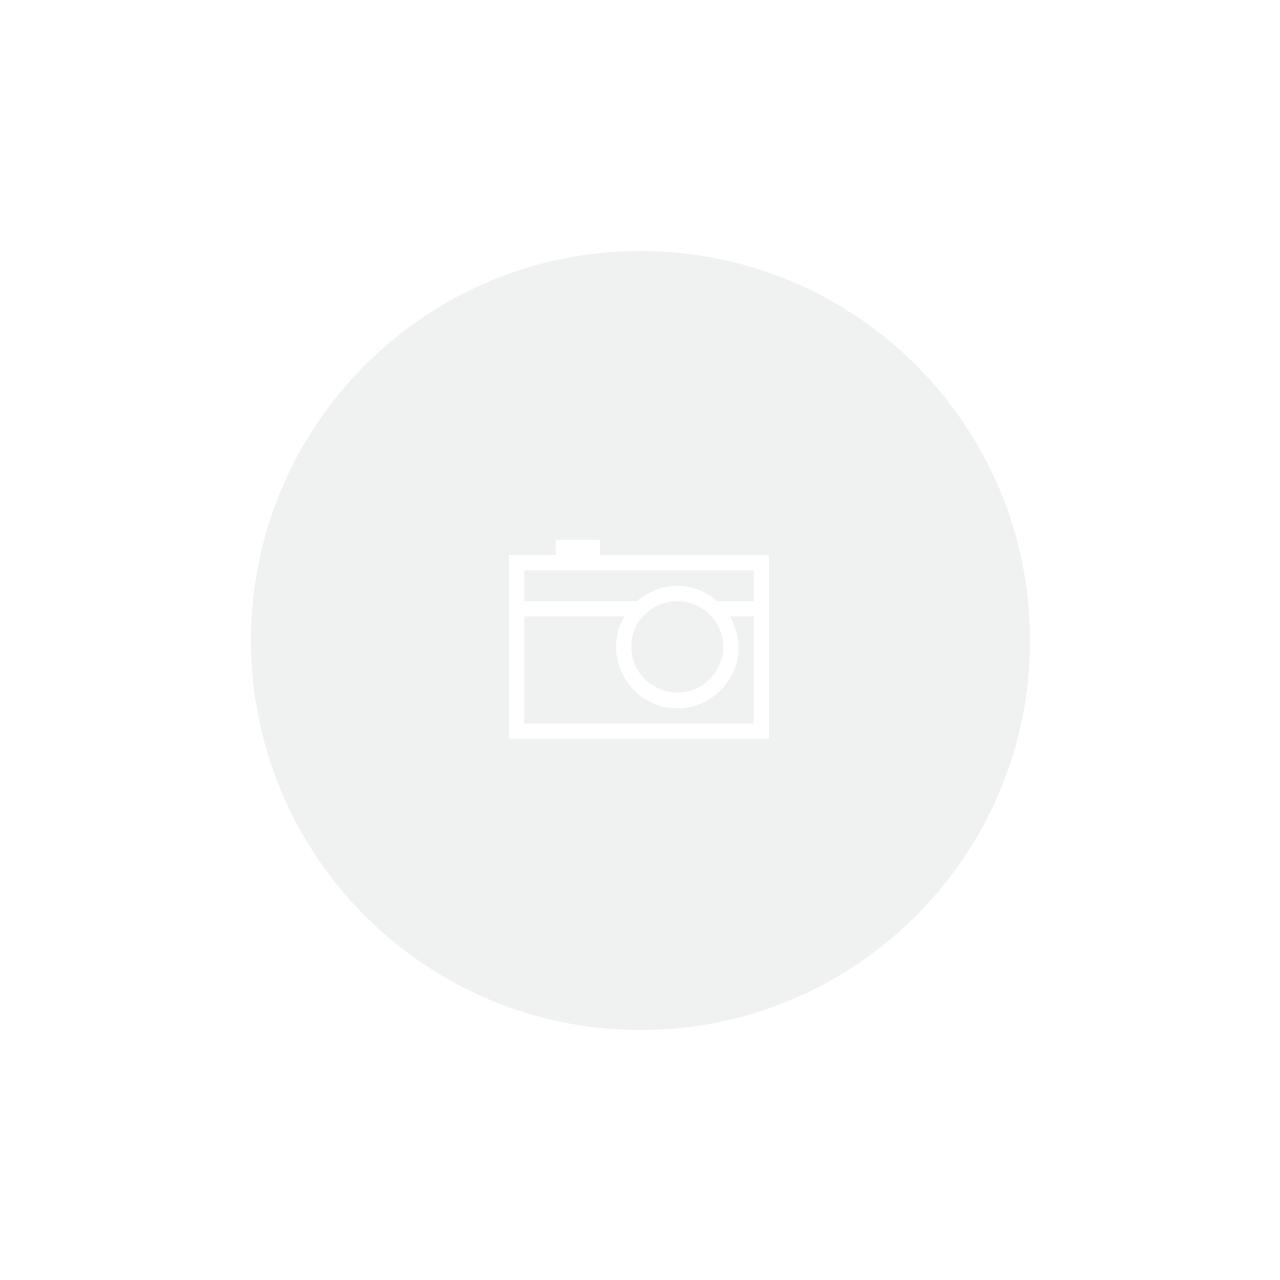 Filtro de ar Inbox BMC Air Filter para Fiat 500